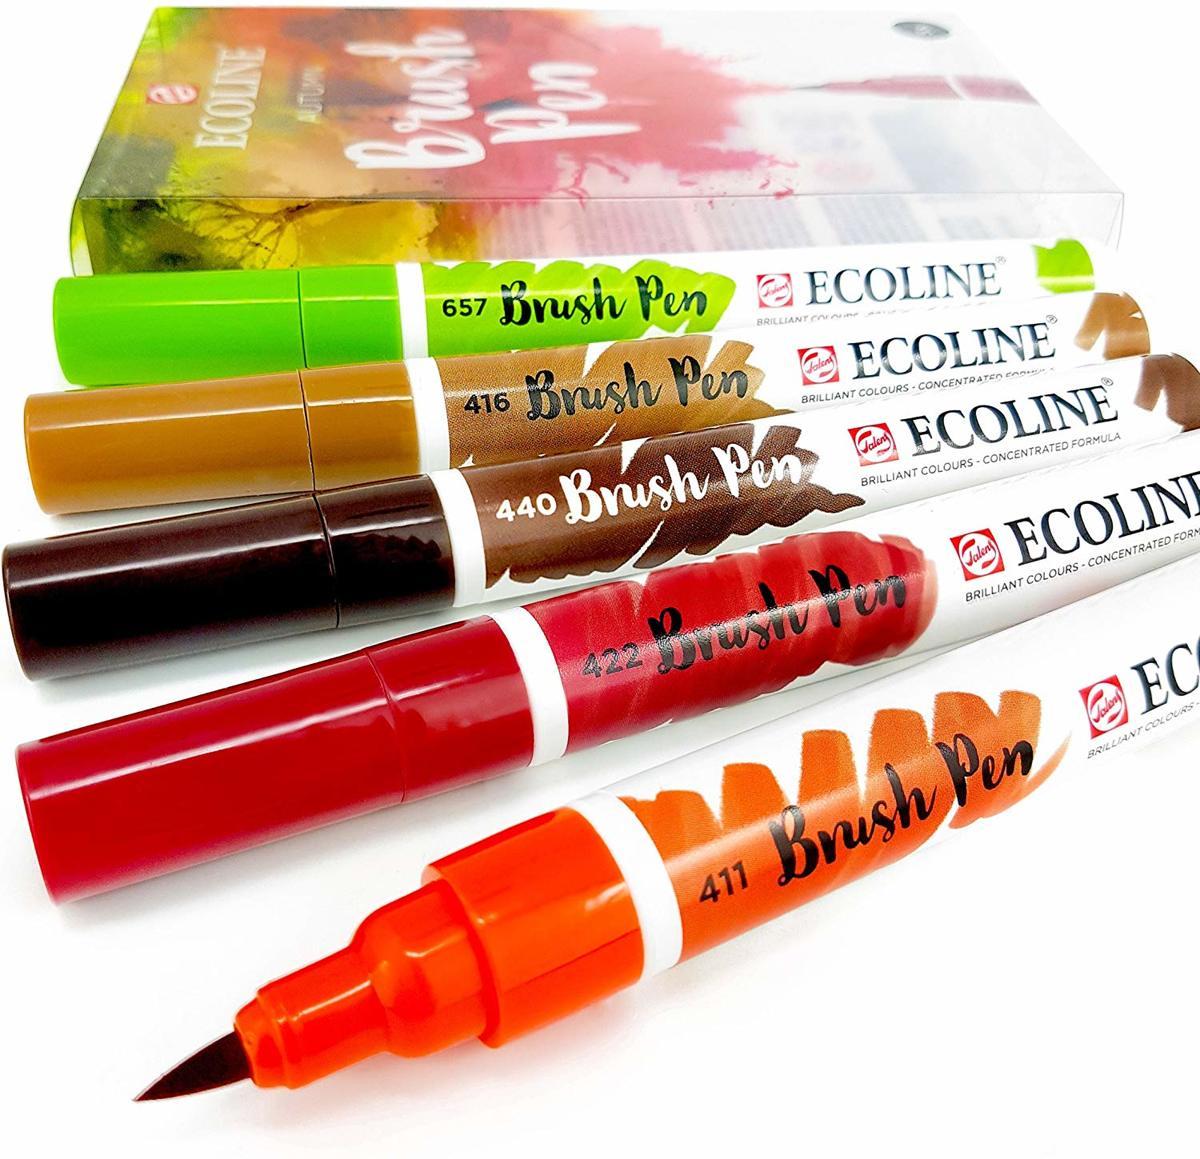 Talens Ecoline Brushpen Set met 5 Pennen (Herfst) + 1 Brush Pen Blender verpakt in een handige Zipperbag + 1 x A4 Ecoline/aquarelblok + Basis Boekje Brush/Handlettering